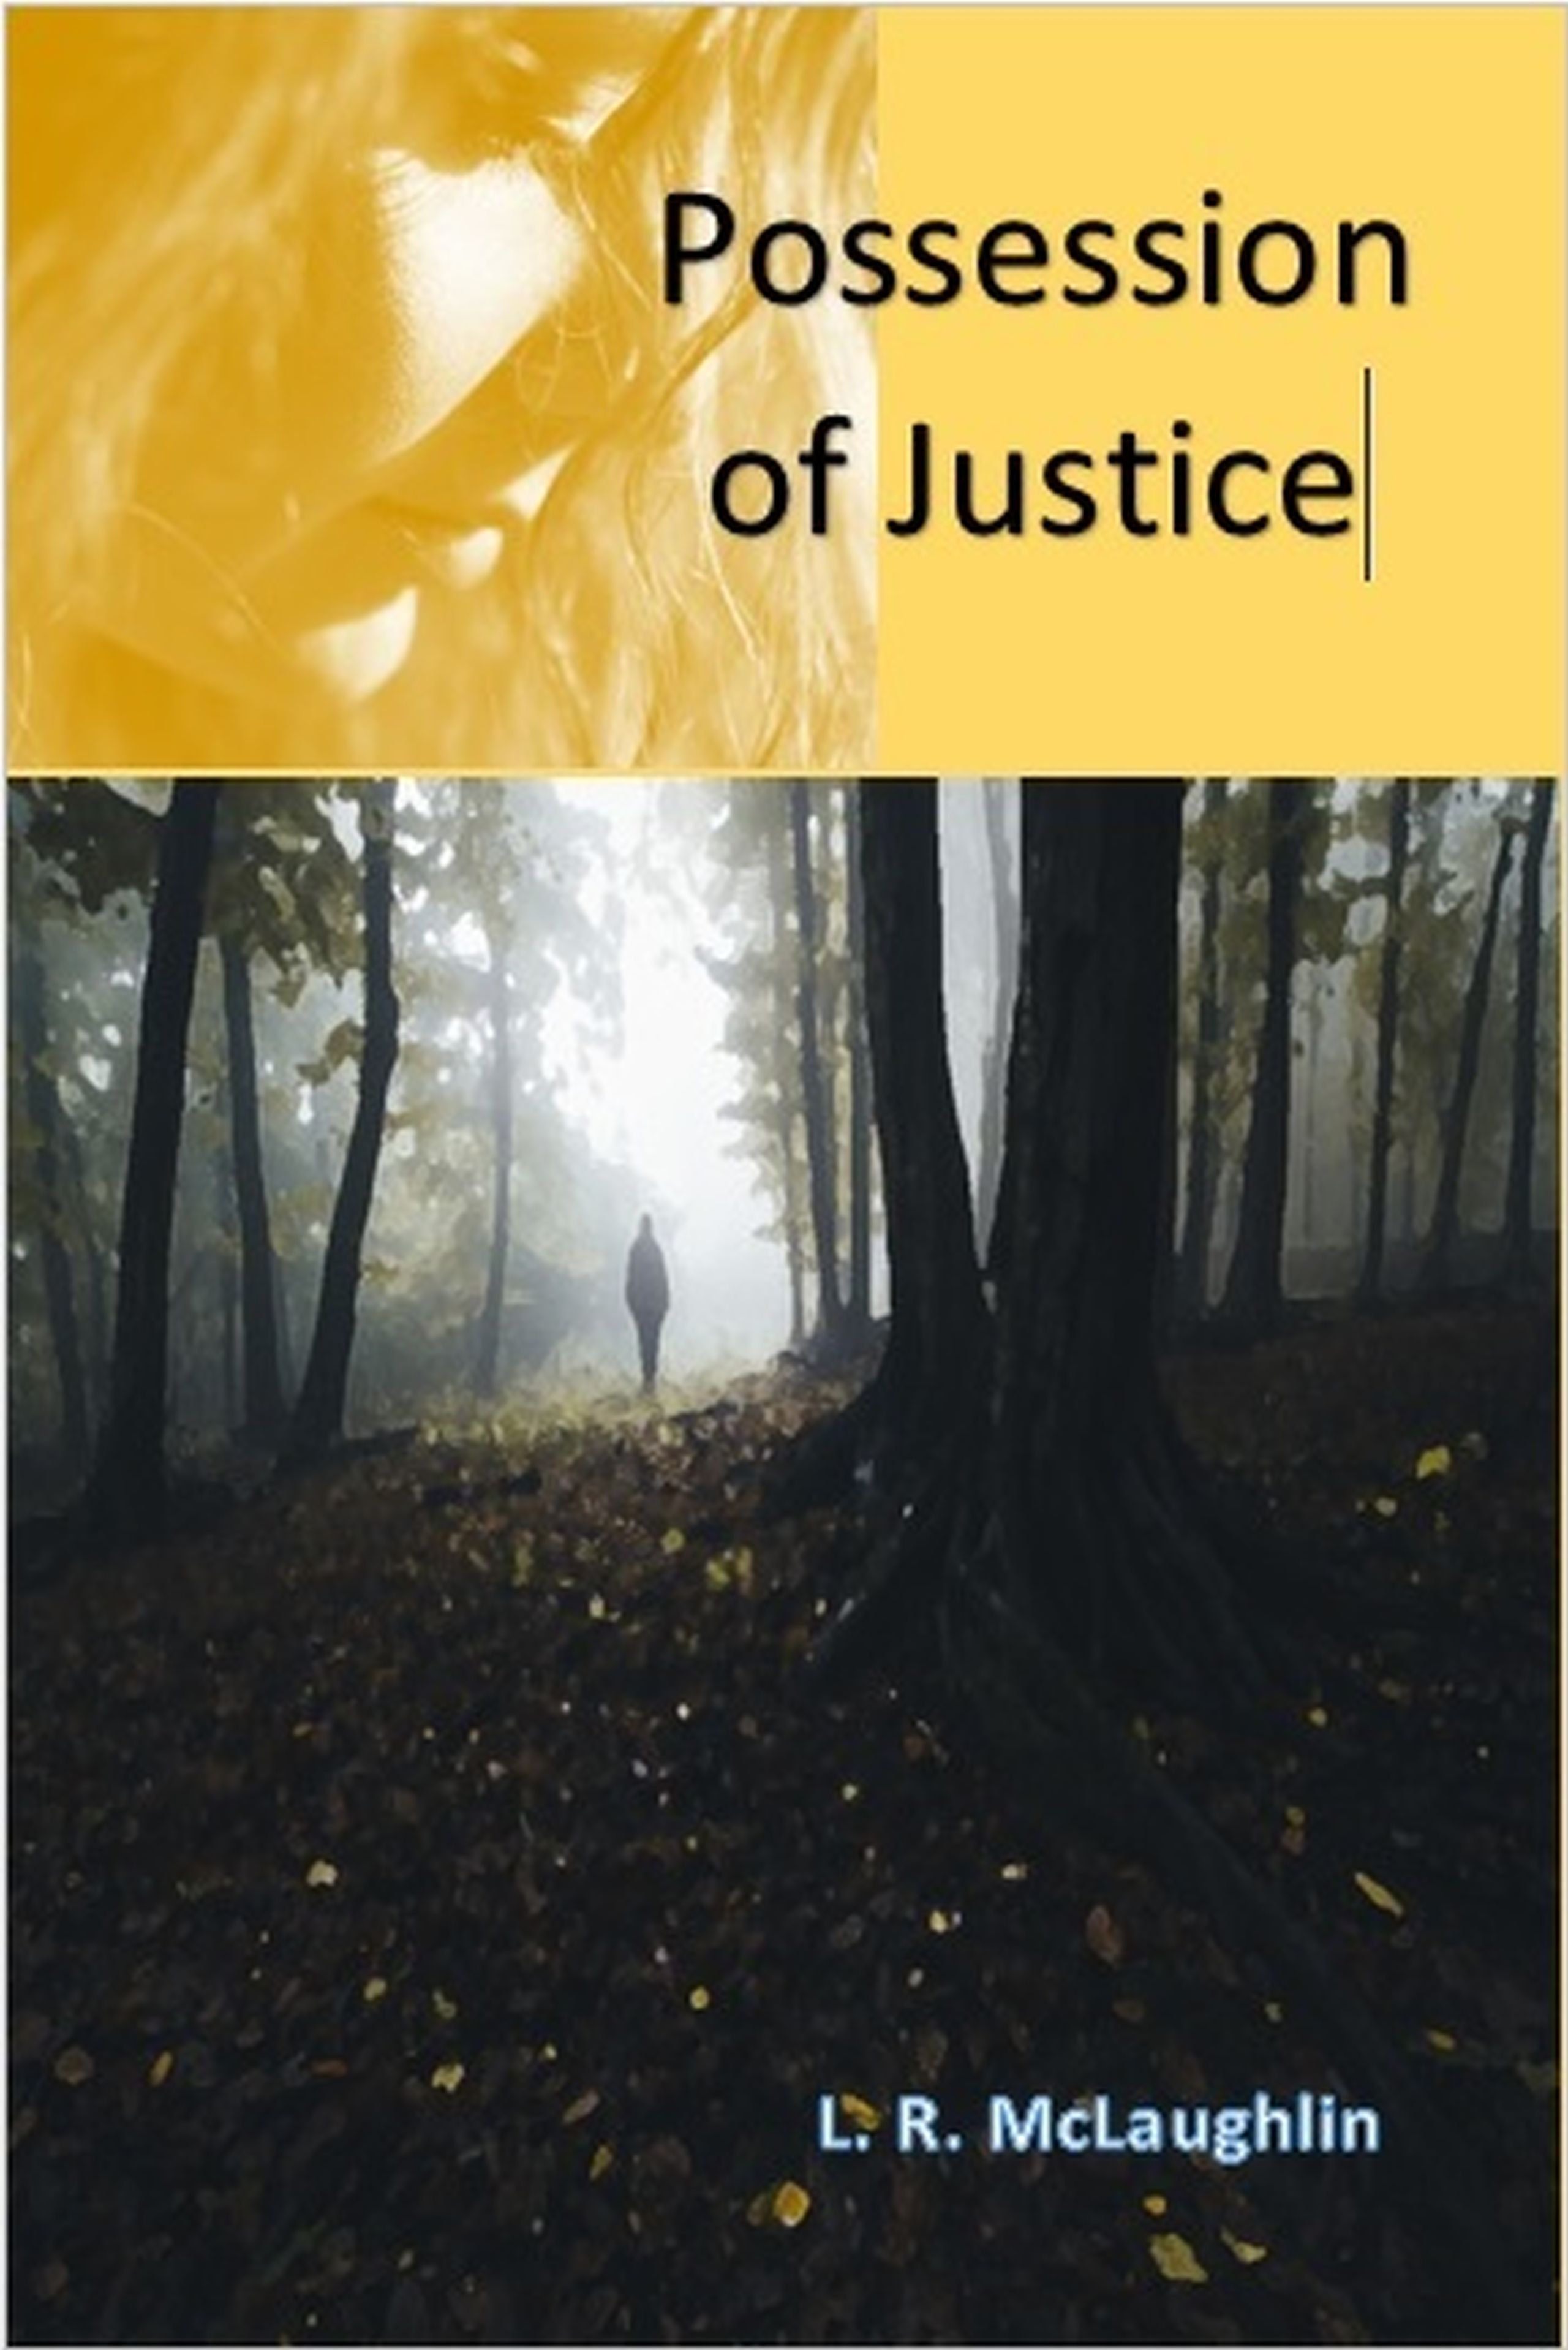 Possession of Justice L.R. McLaughlin